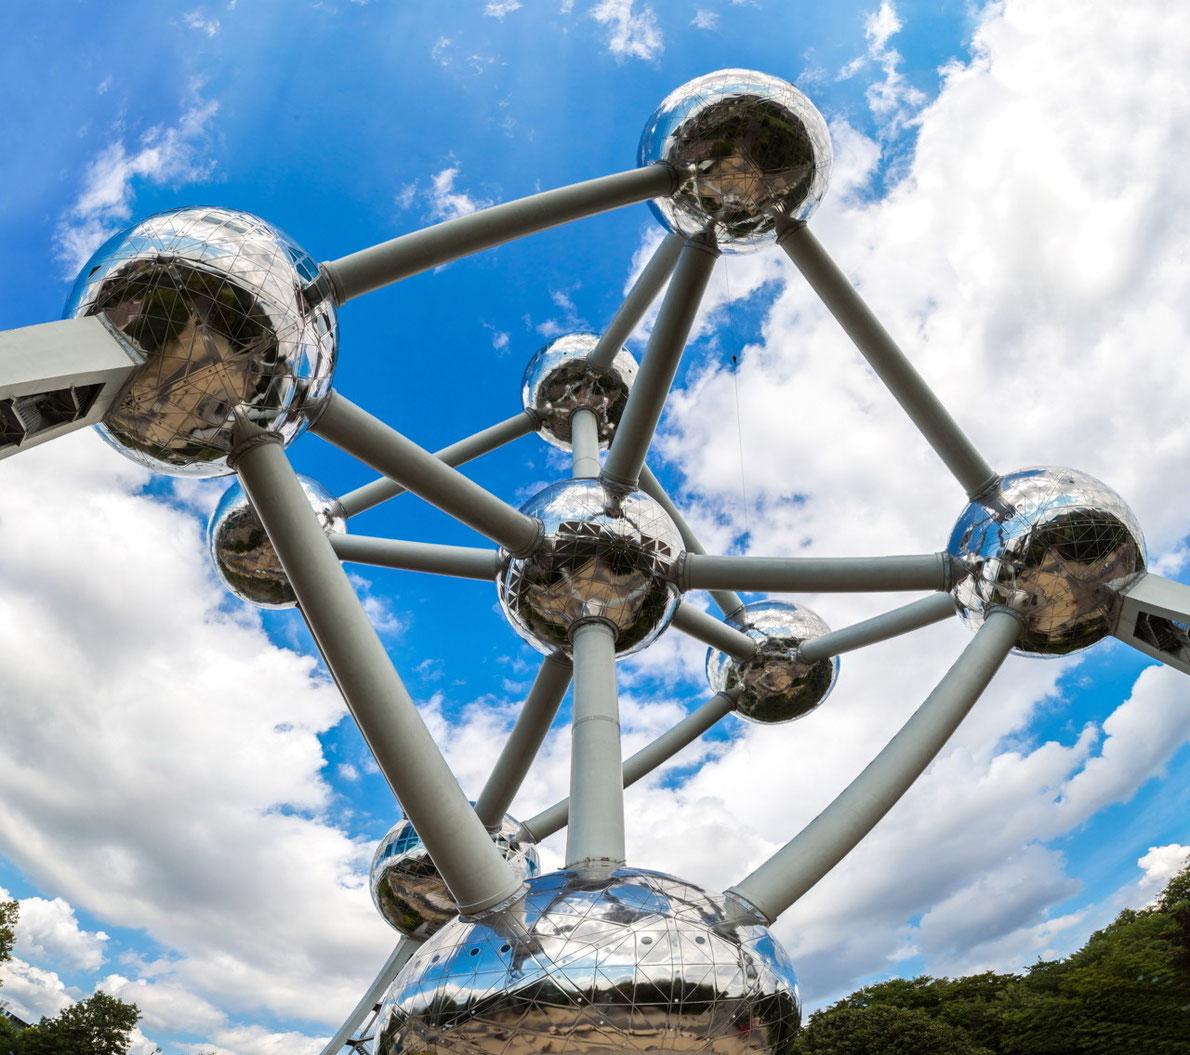 Atomium Brussels - بهترین مقصد اروپا